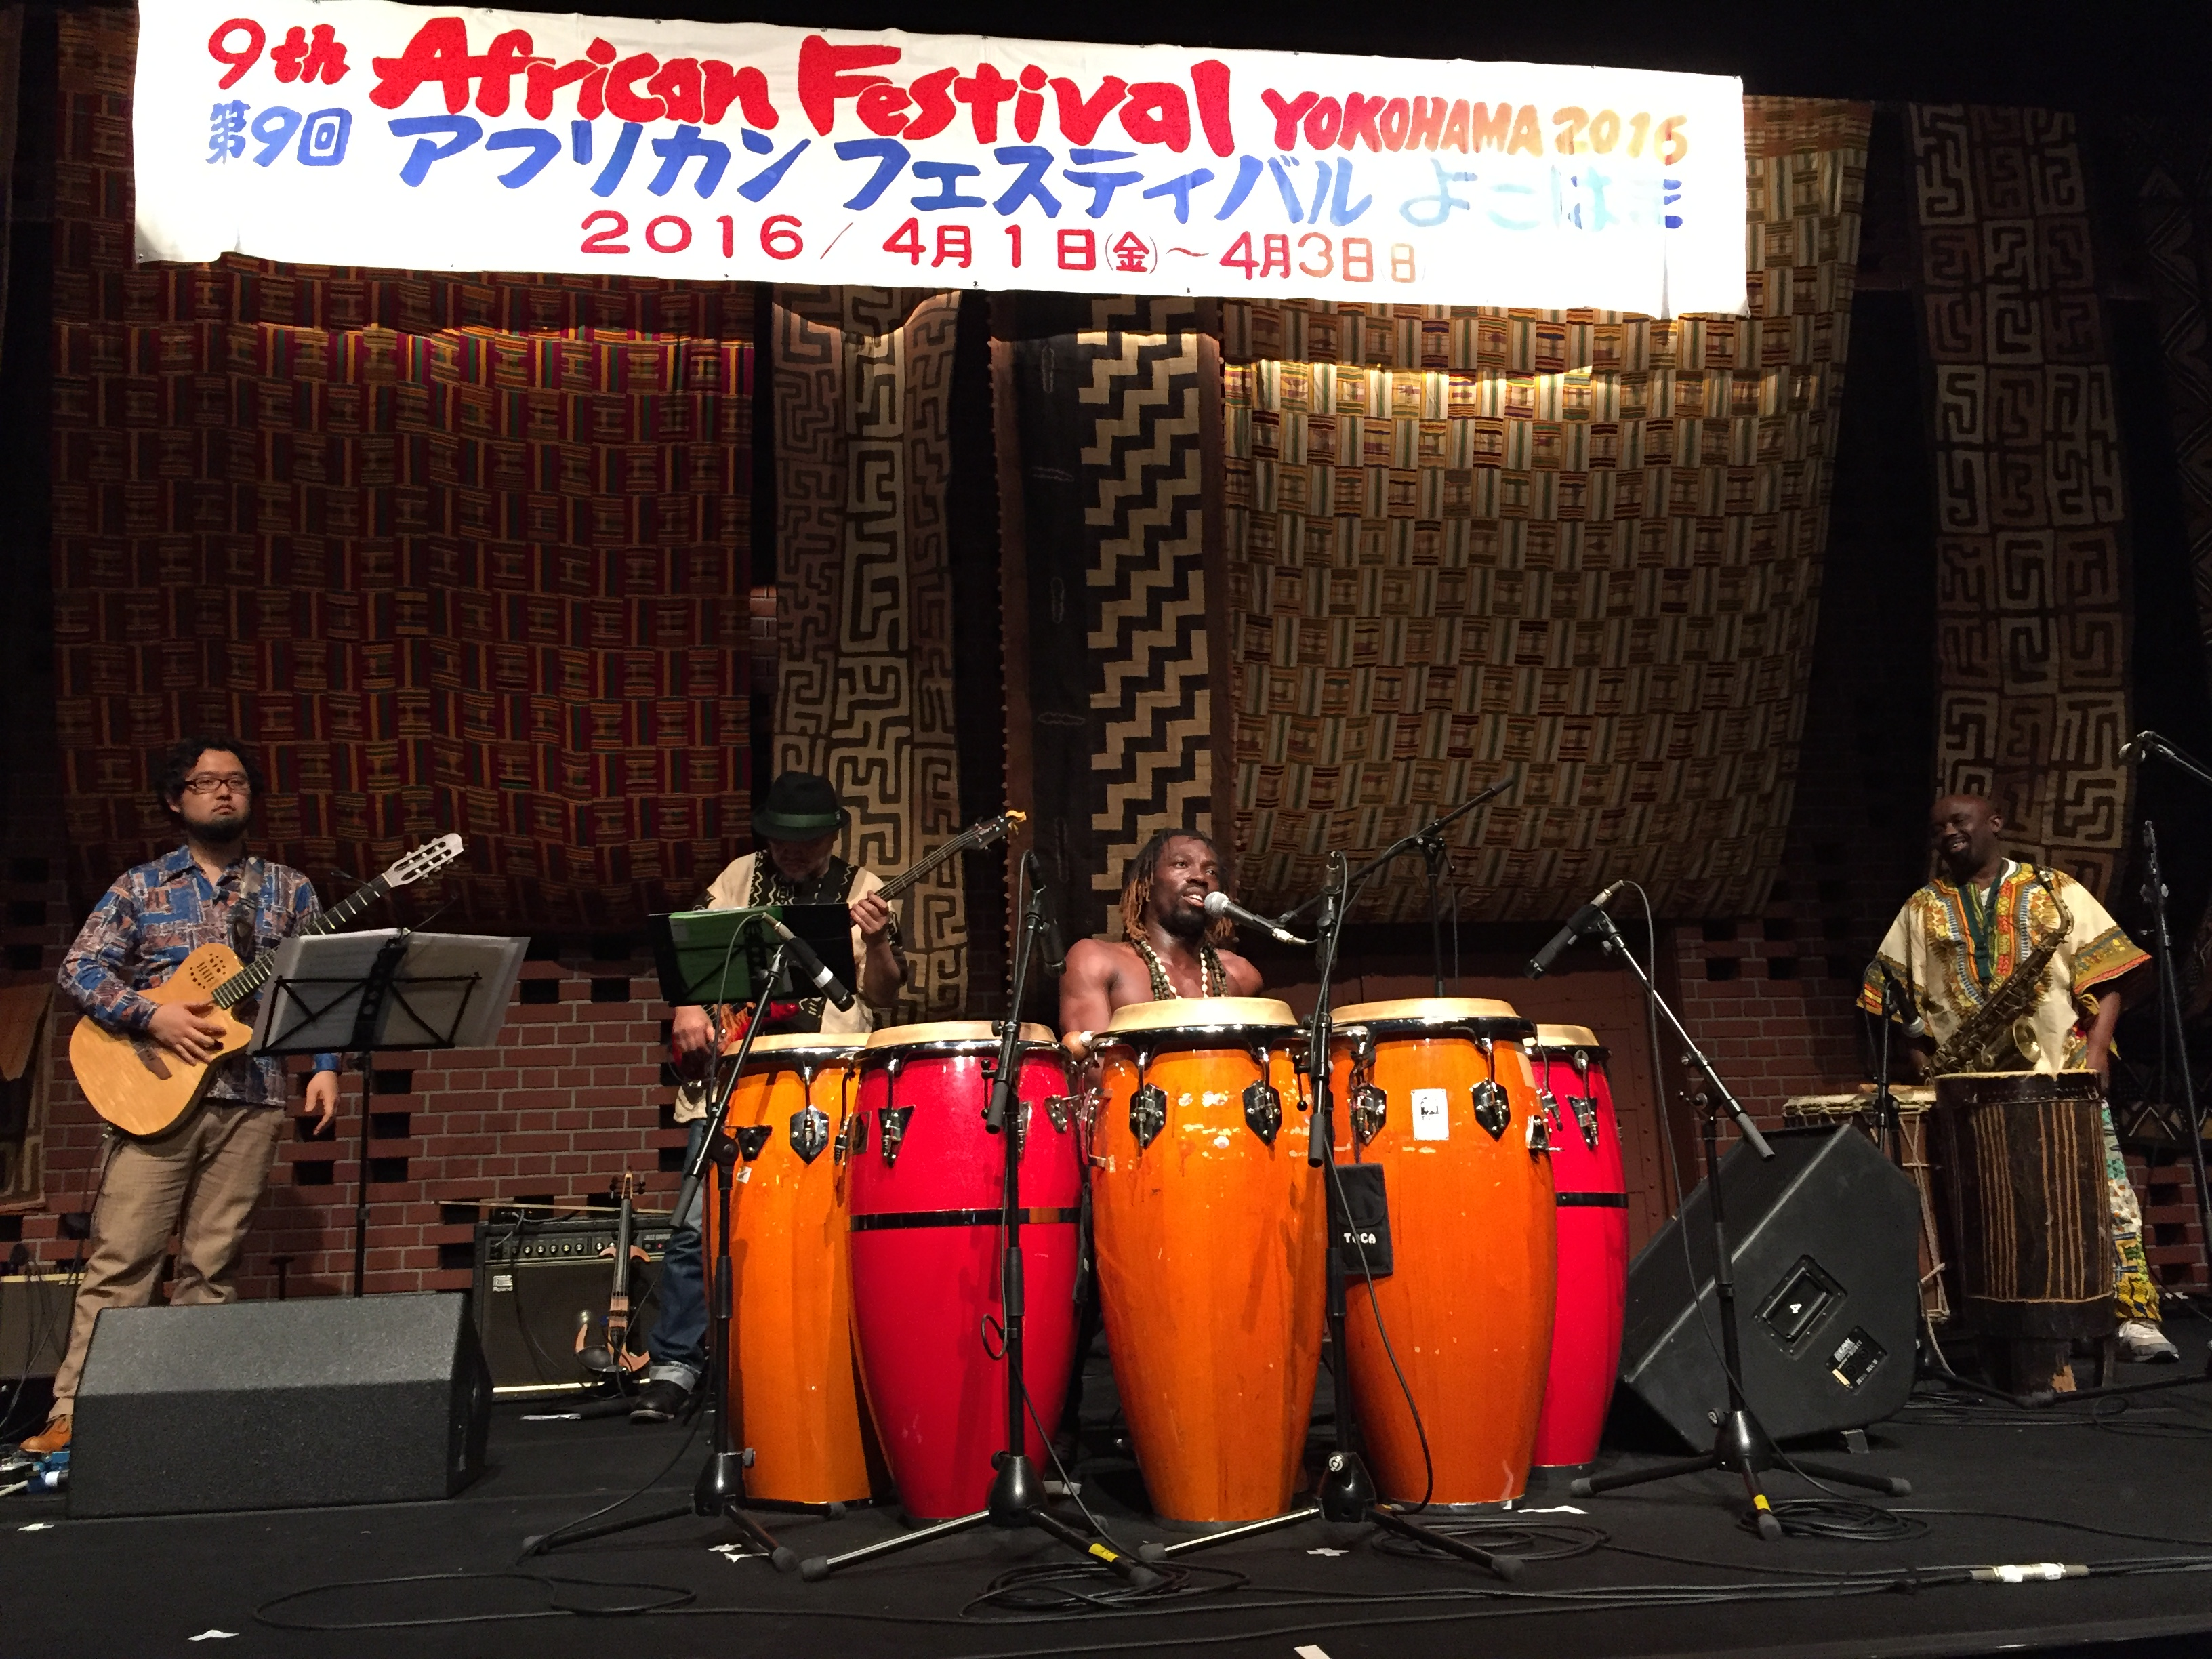 Take 6★オズワルド・コアメin アフリカンフェスティバルよこはま2016 – #1